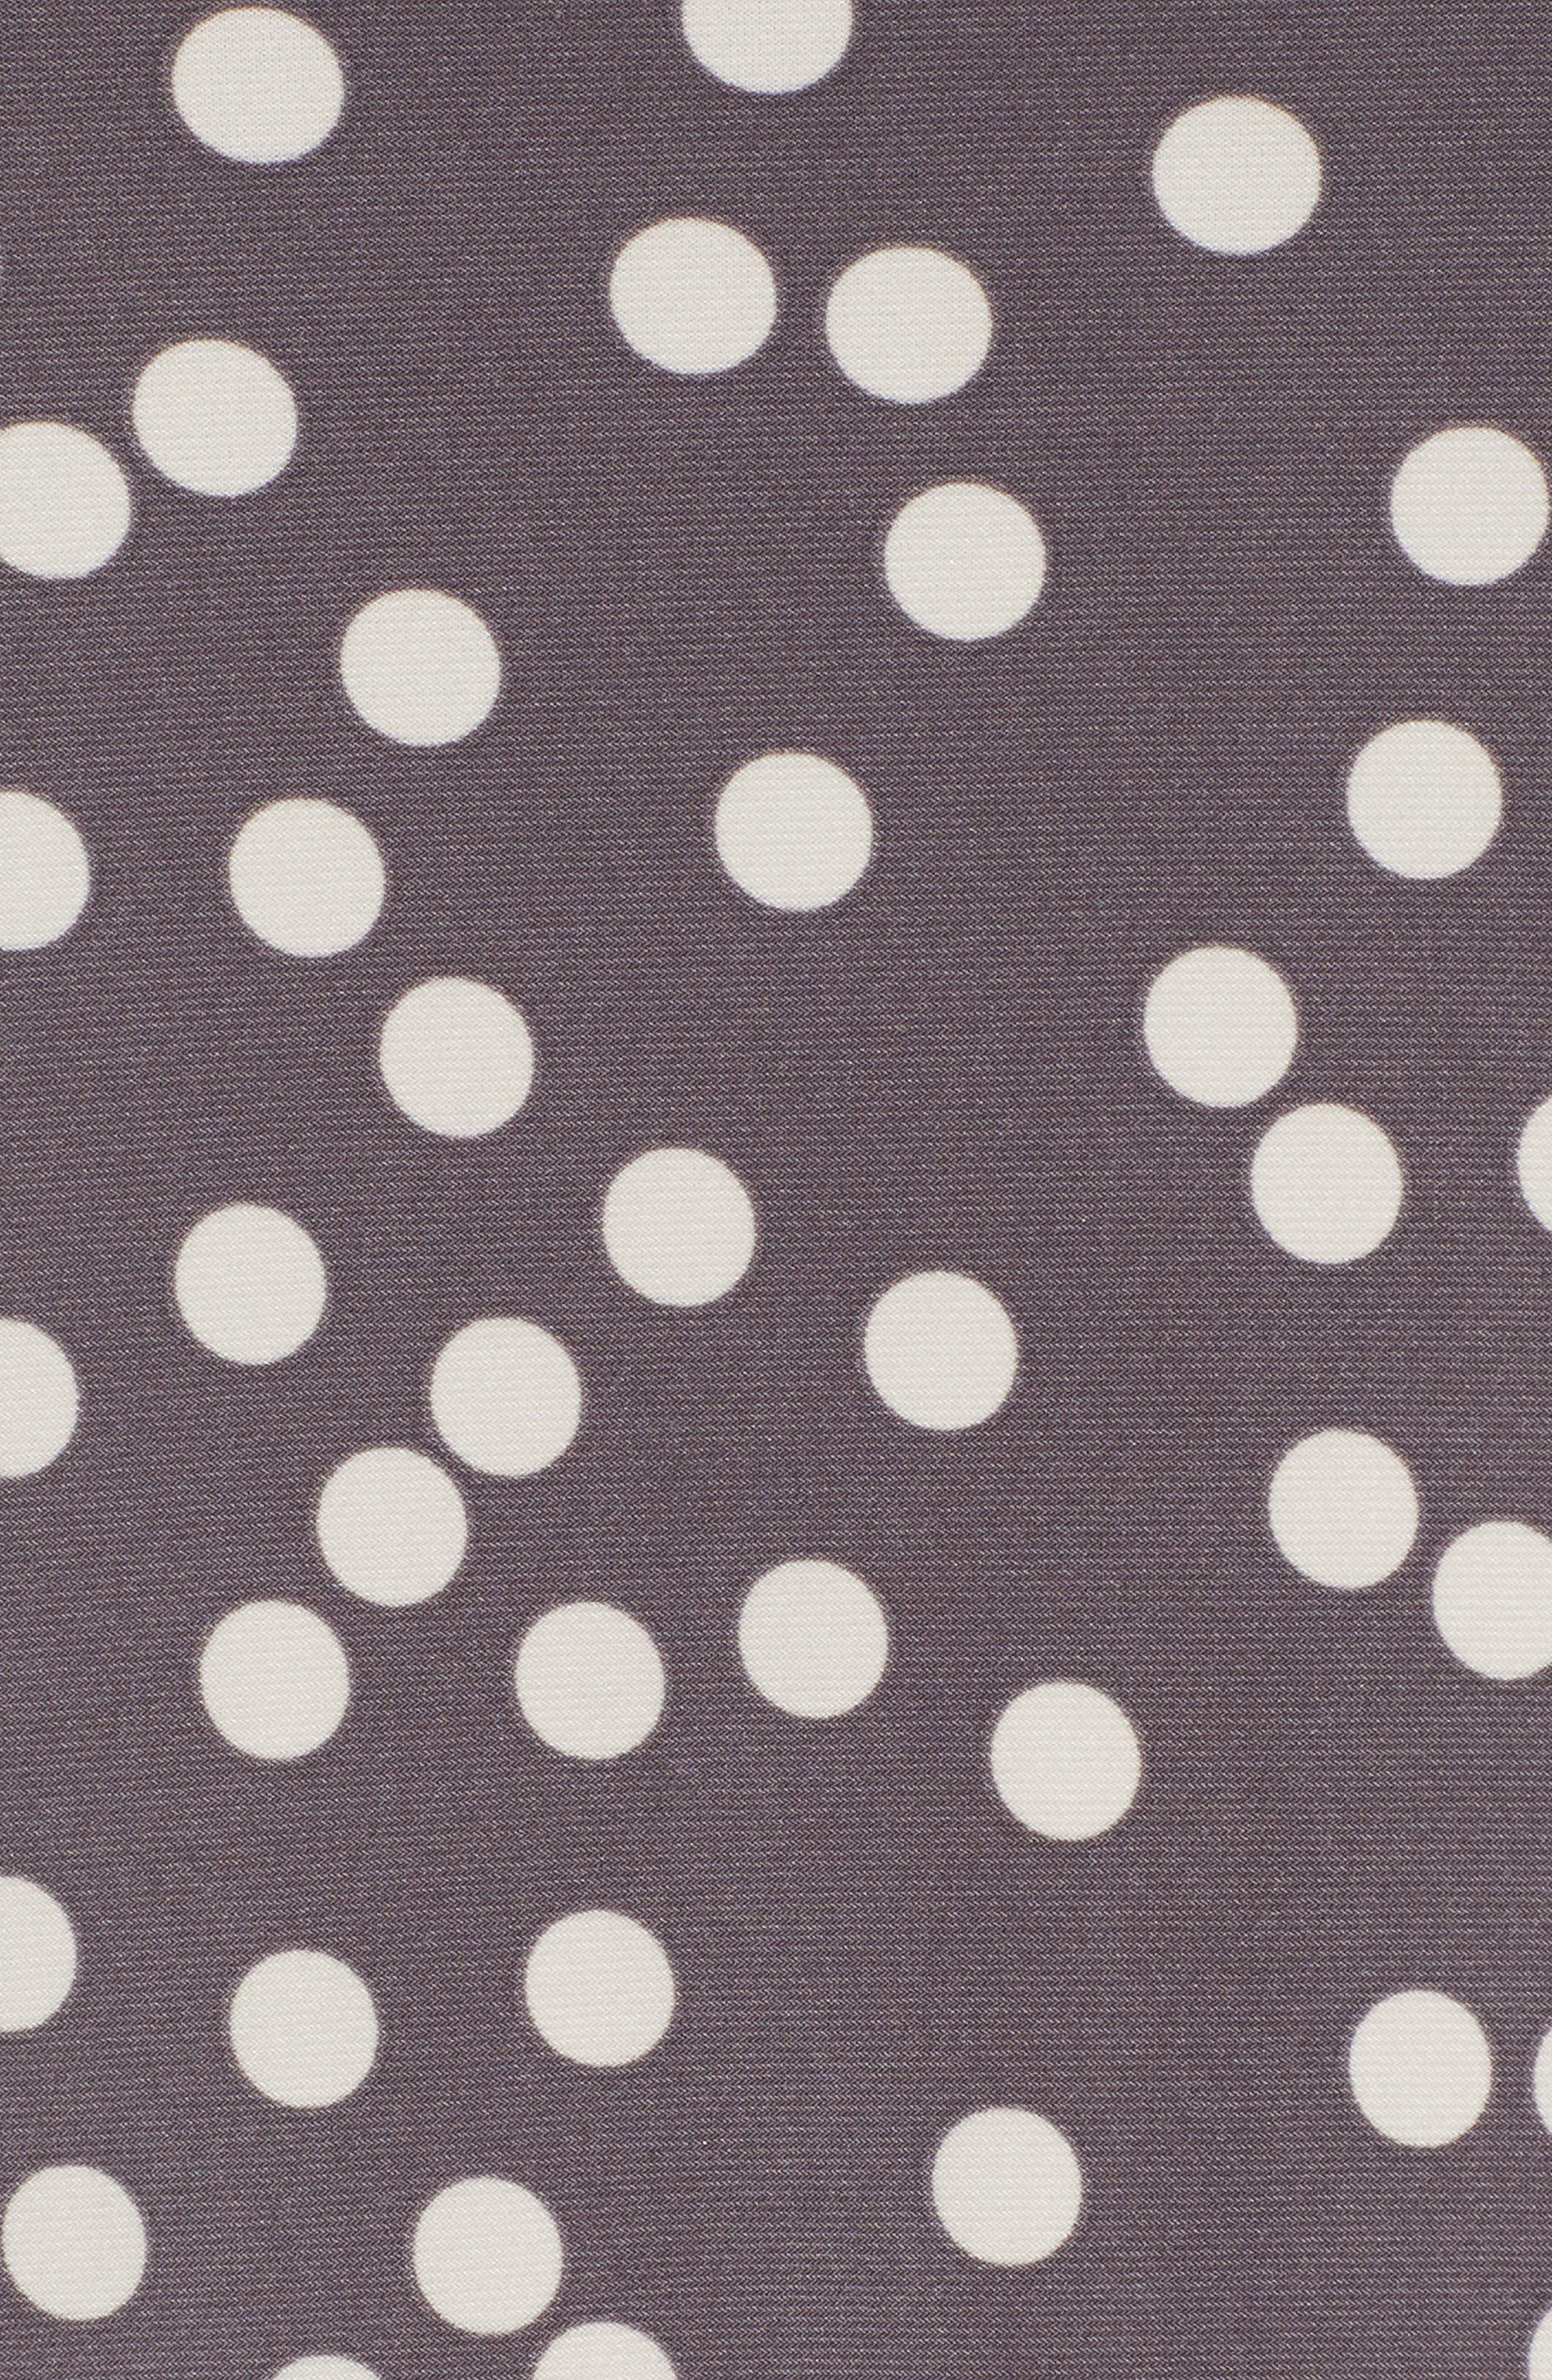 Dot Print Swing Dress,                             Alternate thumbnail 6, color,                             Nantucket Grey/ Oyster Shell